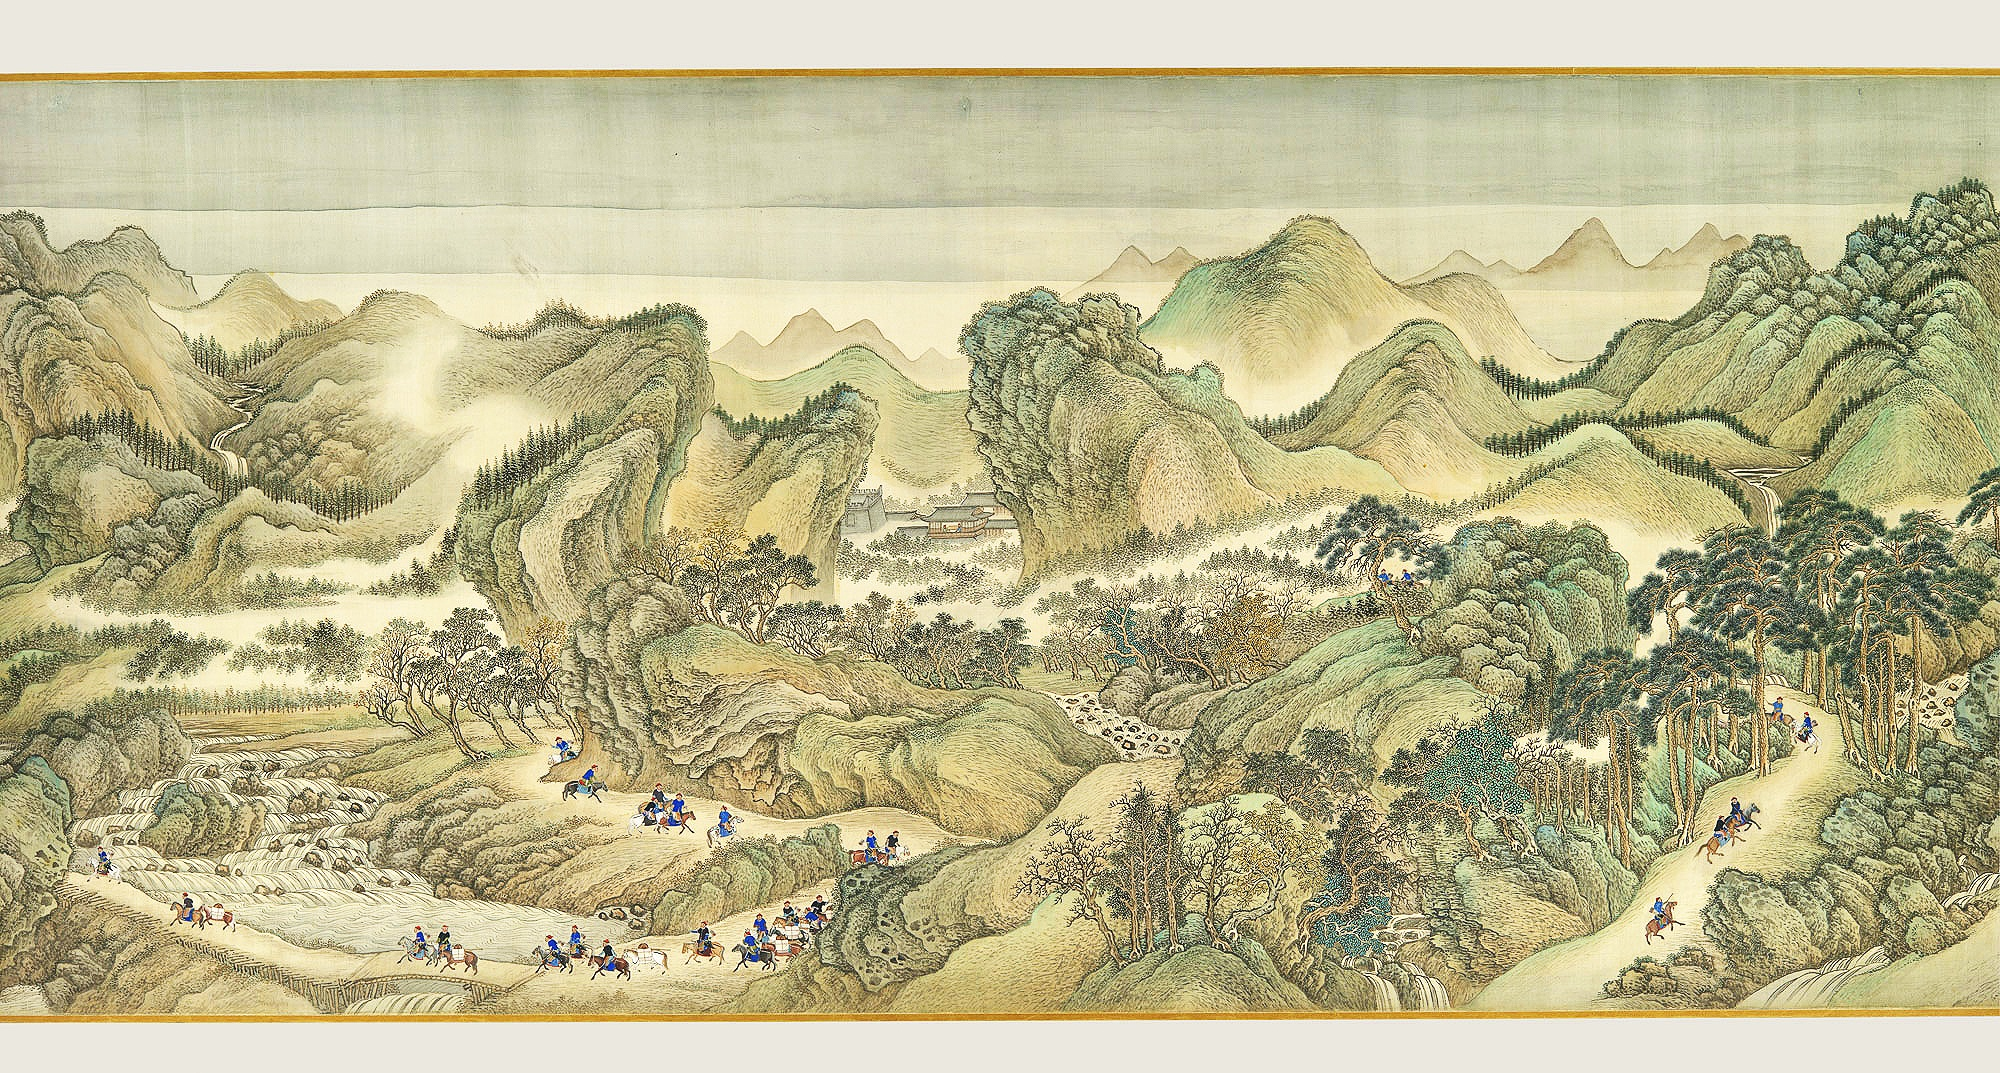 ( The Kangxi Emperor's Southern Inspection Tour, Scroll Three: Ji'nan to Mount Tai )